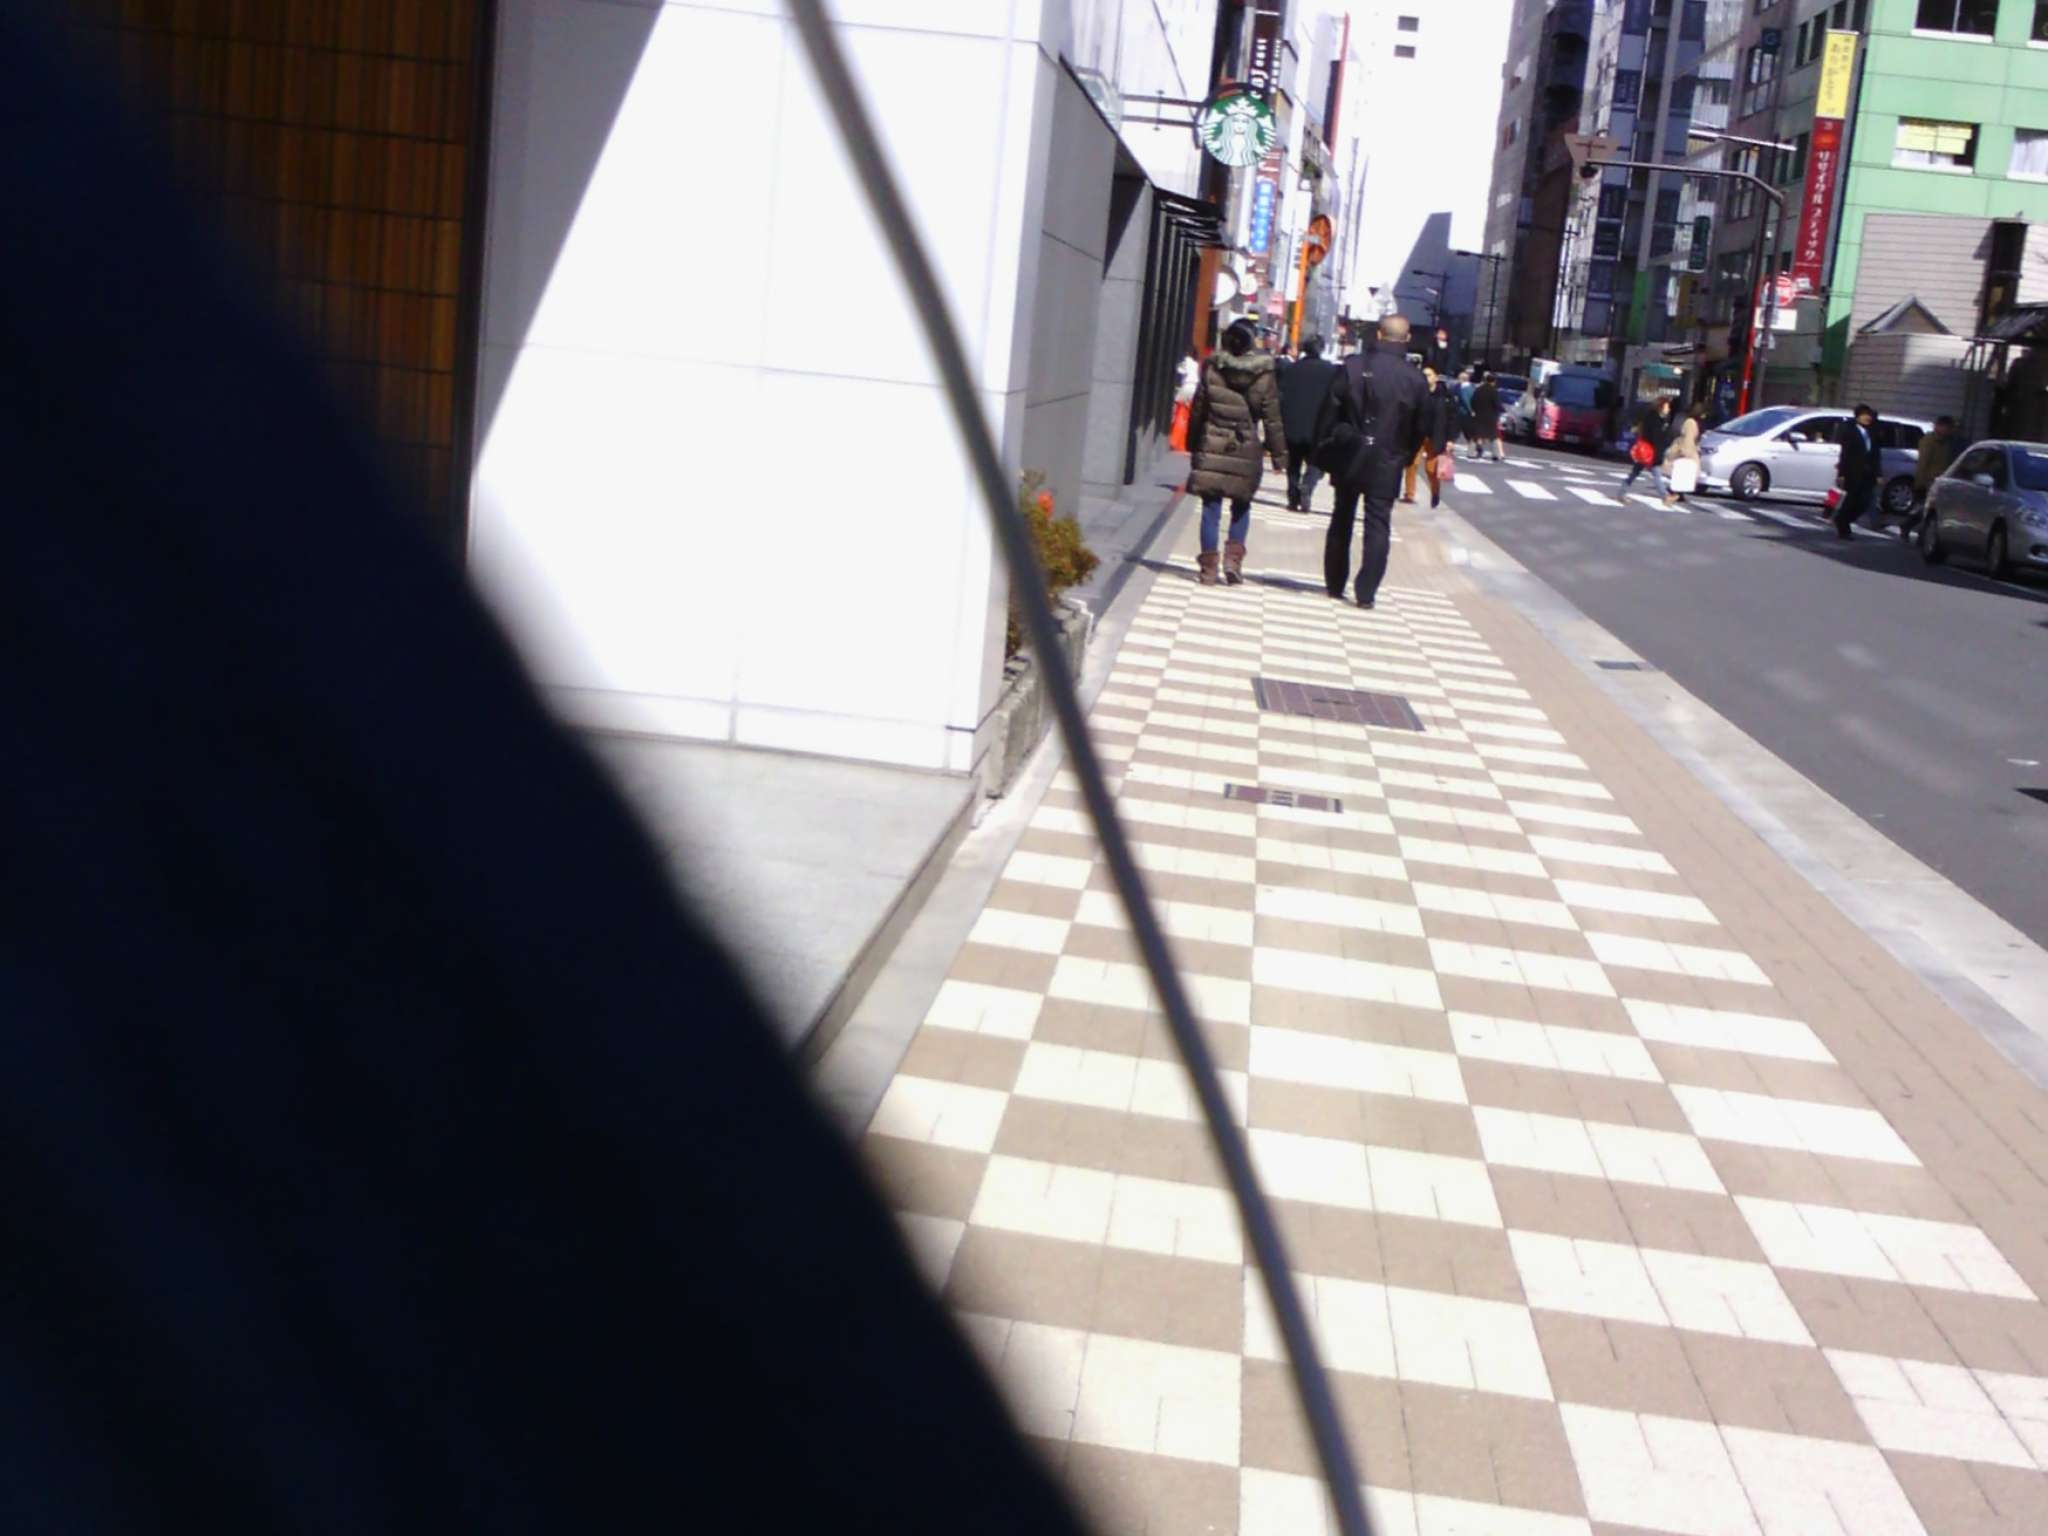 140306 nc photo3